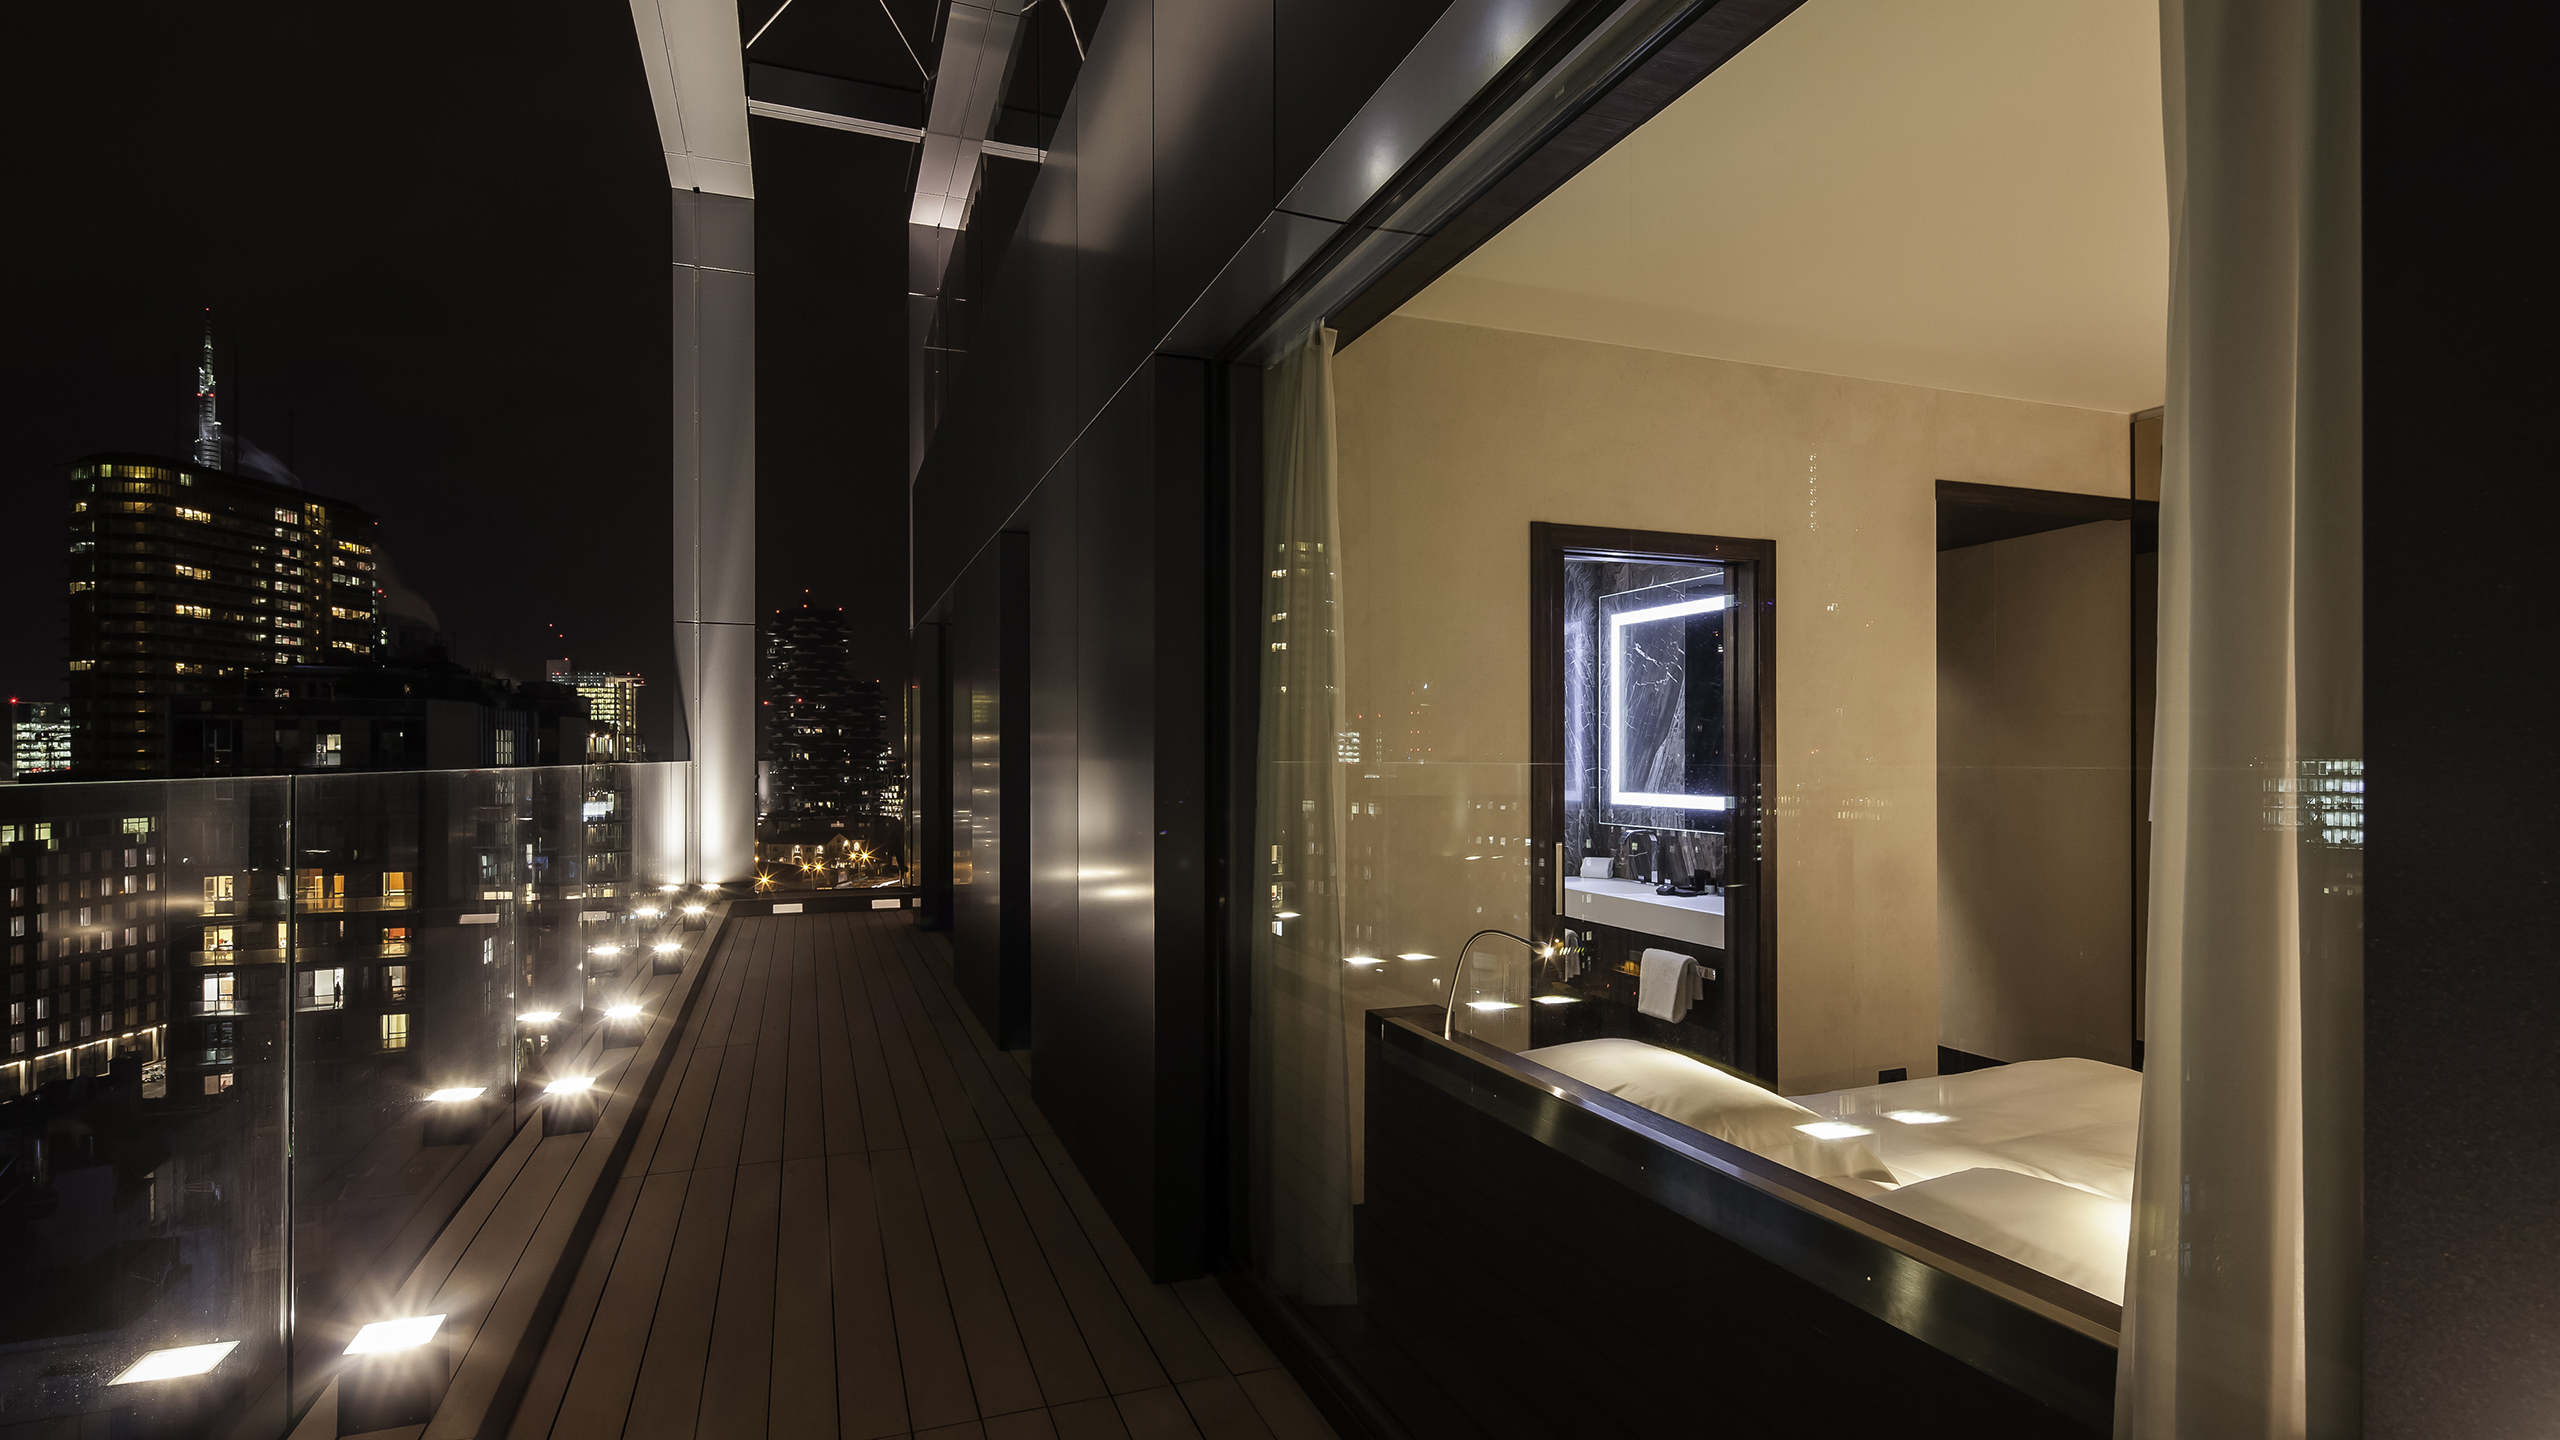 Luxushotel Mailand – LaGare Hotel Milano Centrale - MGallery by Sofitel